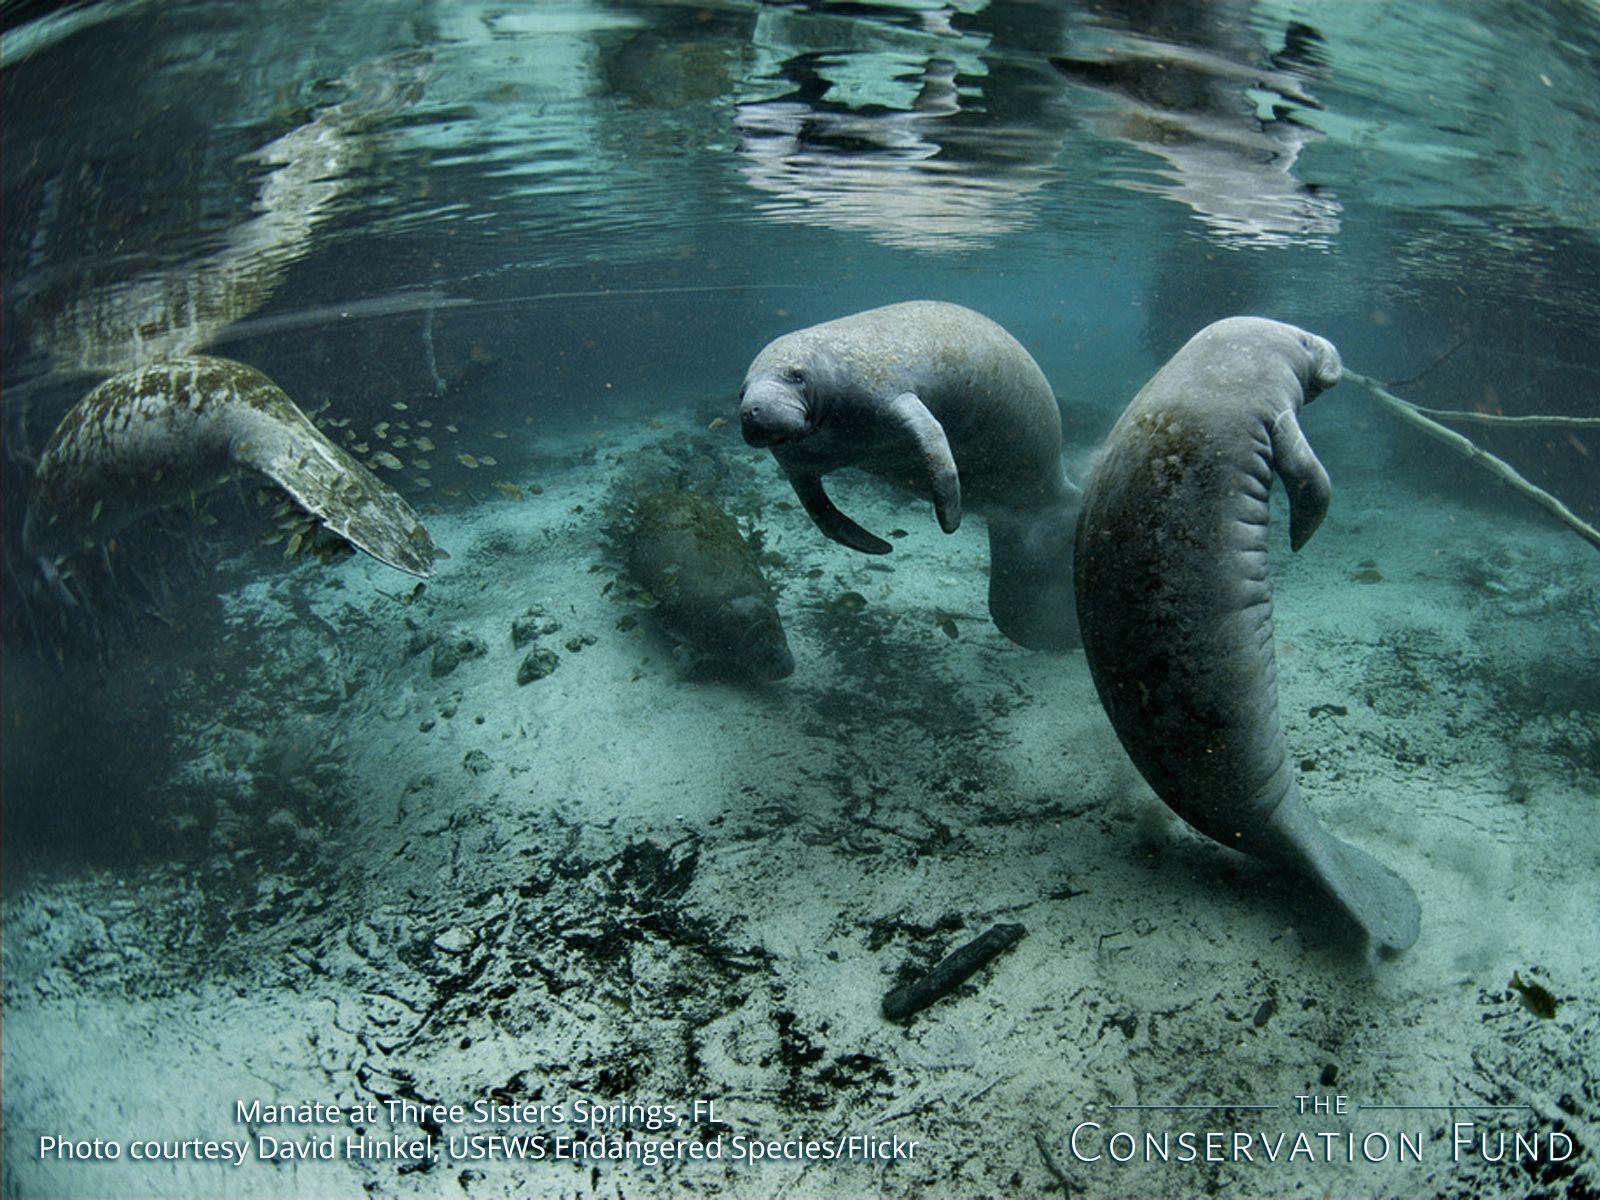 Manatees Three Sisters Springs Florida And Manatee Facts Animals Manatee Manatee Florida